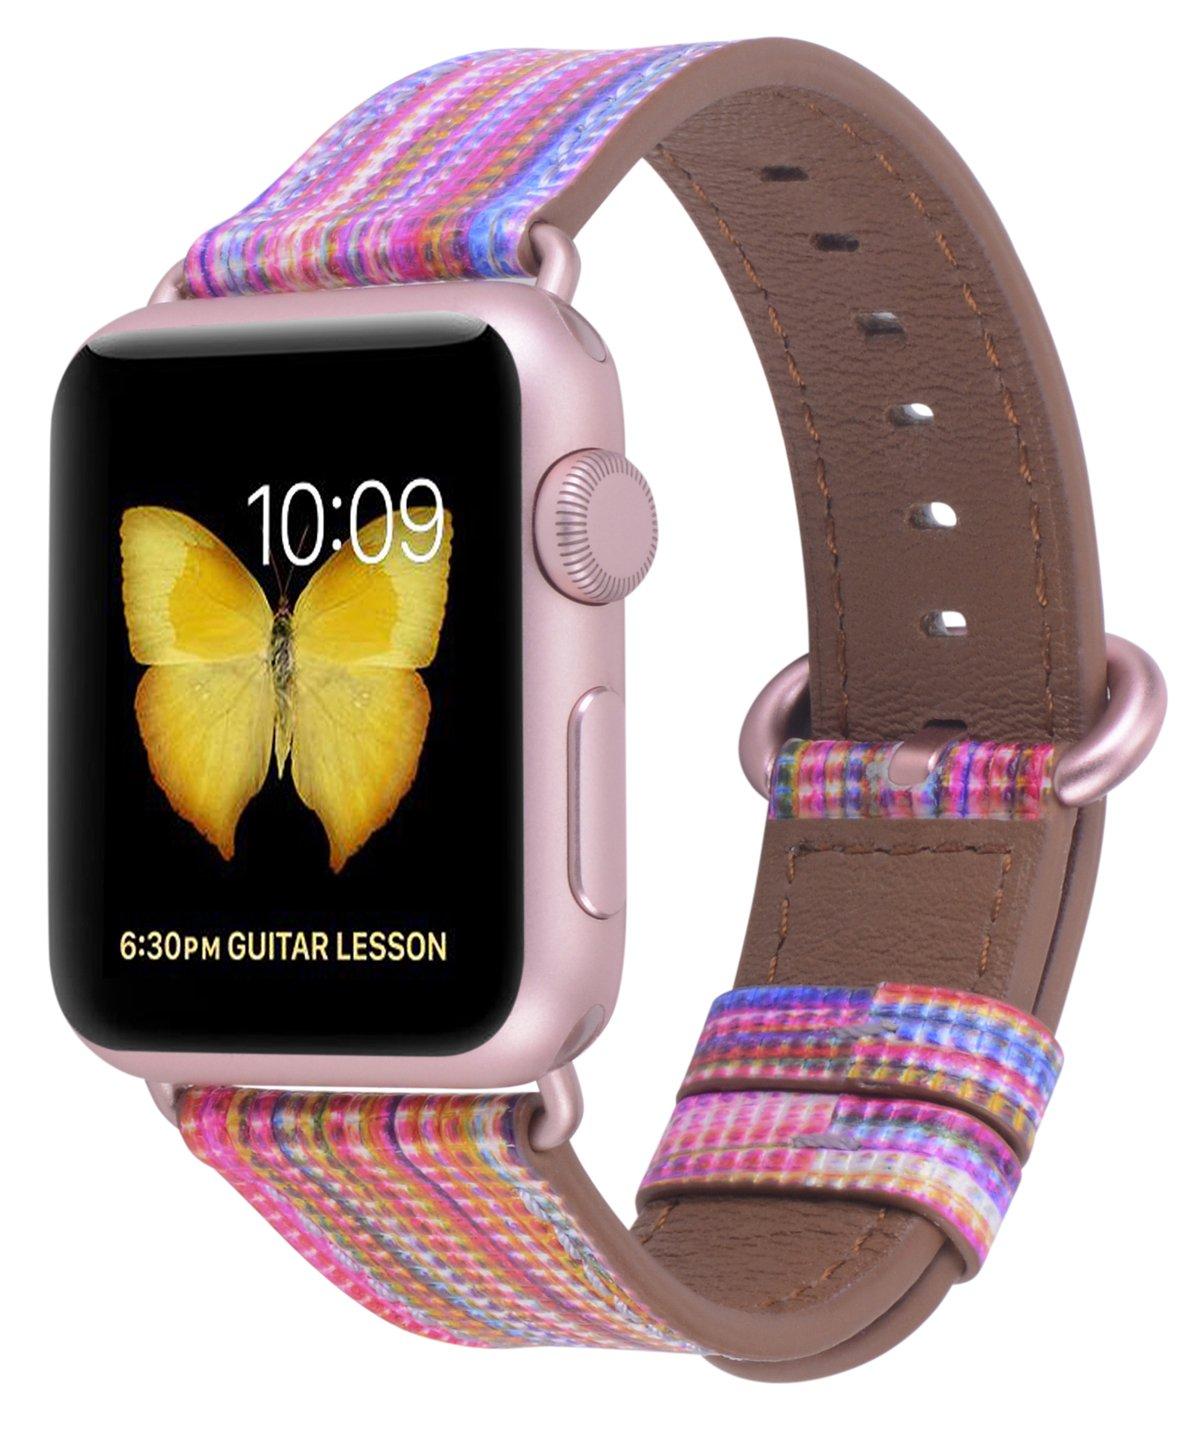 Malla Cuero para Apple Watch (38/40mm) PEAK ZHANG [7JN1HKRM]